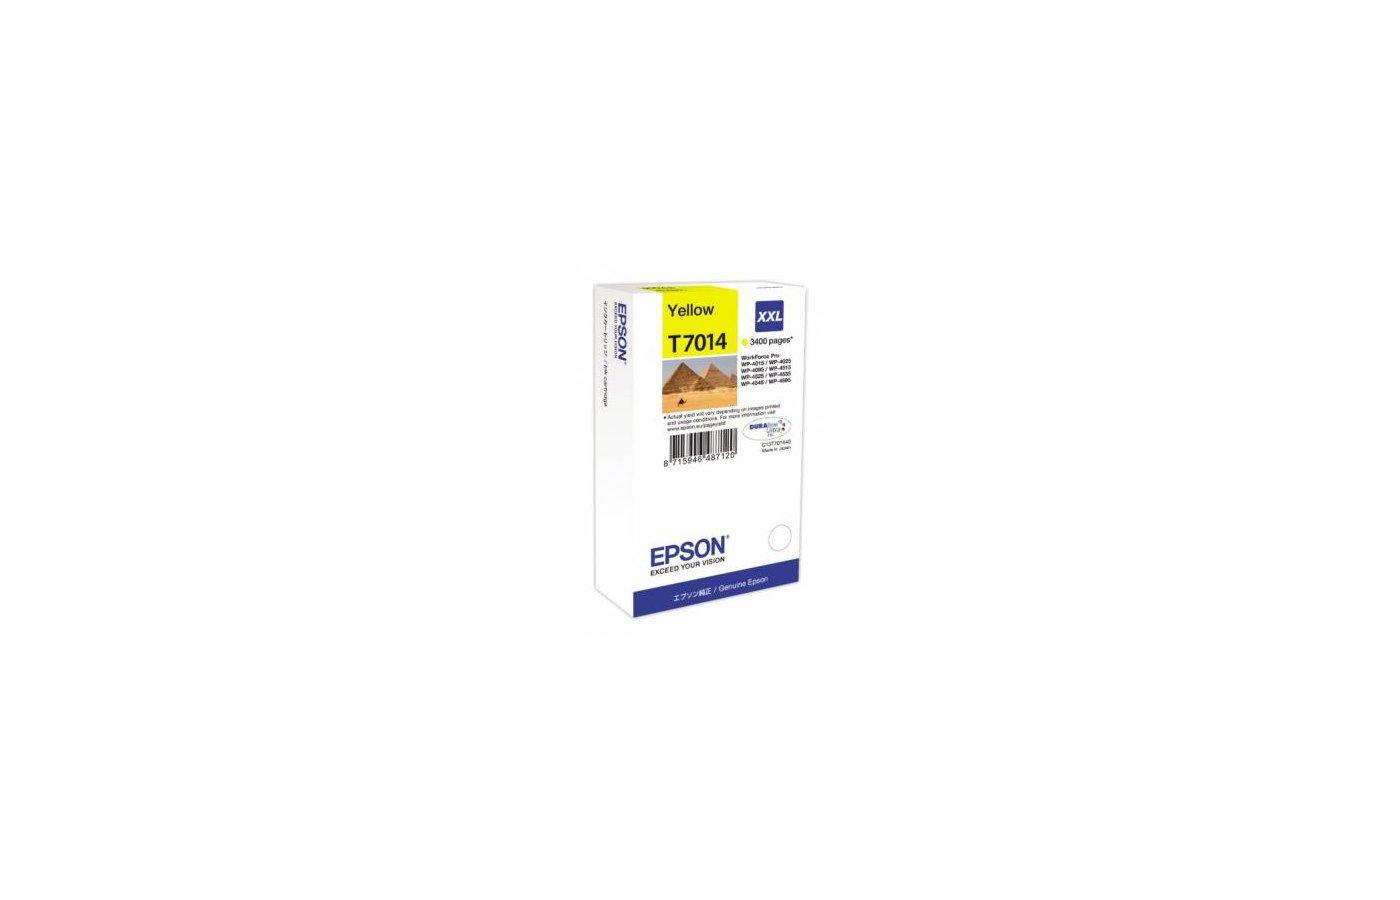 Картридж струйный Epson C13T70144010 картридж (Yellow для WP-4000/5000 series,XL 3.4k (желтый))